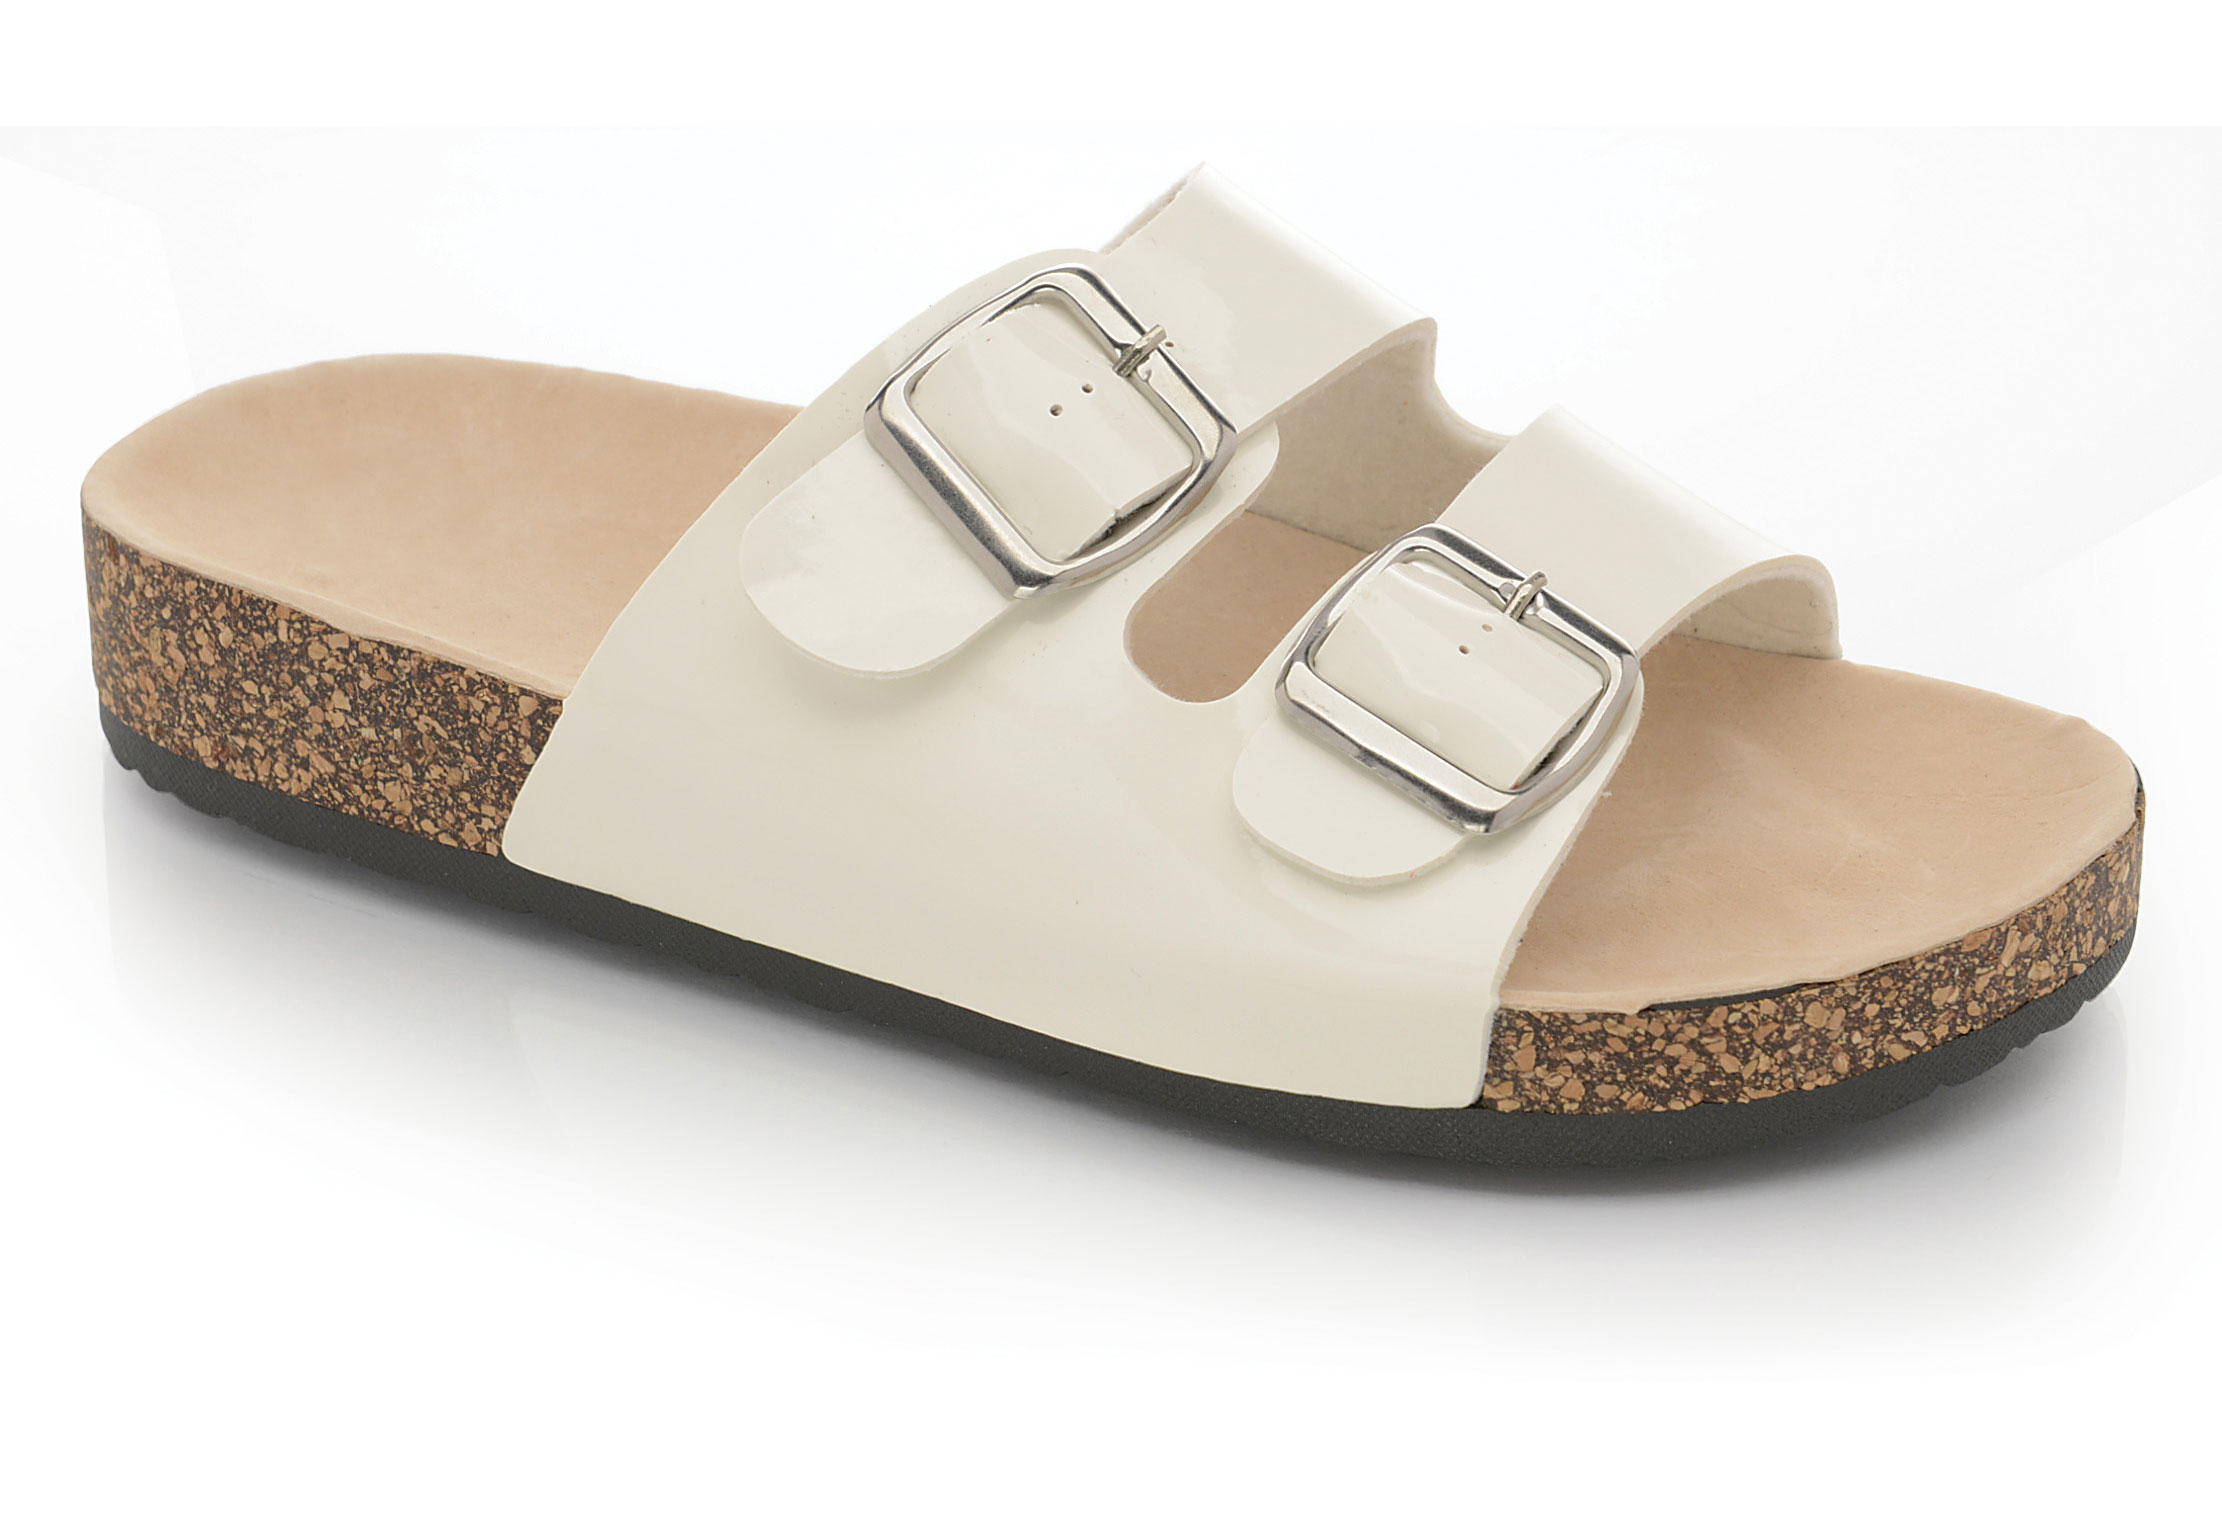 Ladies womens flat sandals summer comfort cork sole